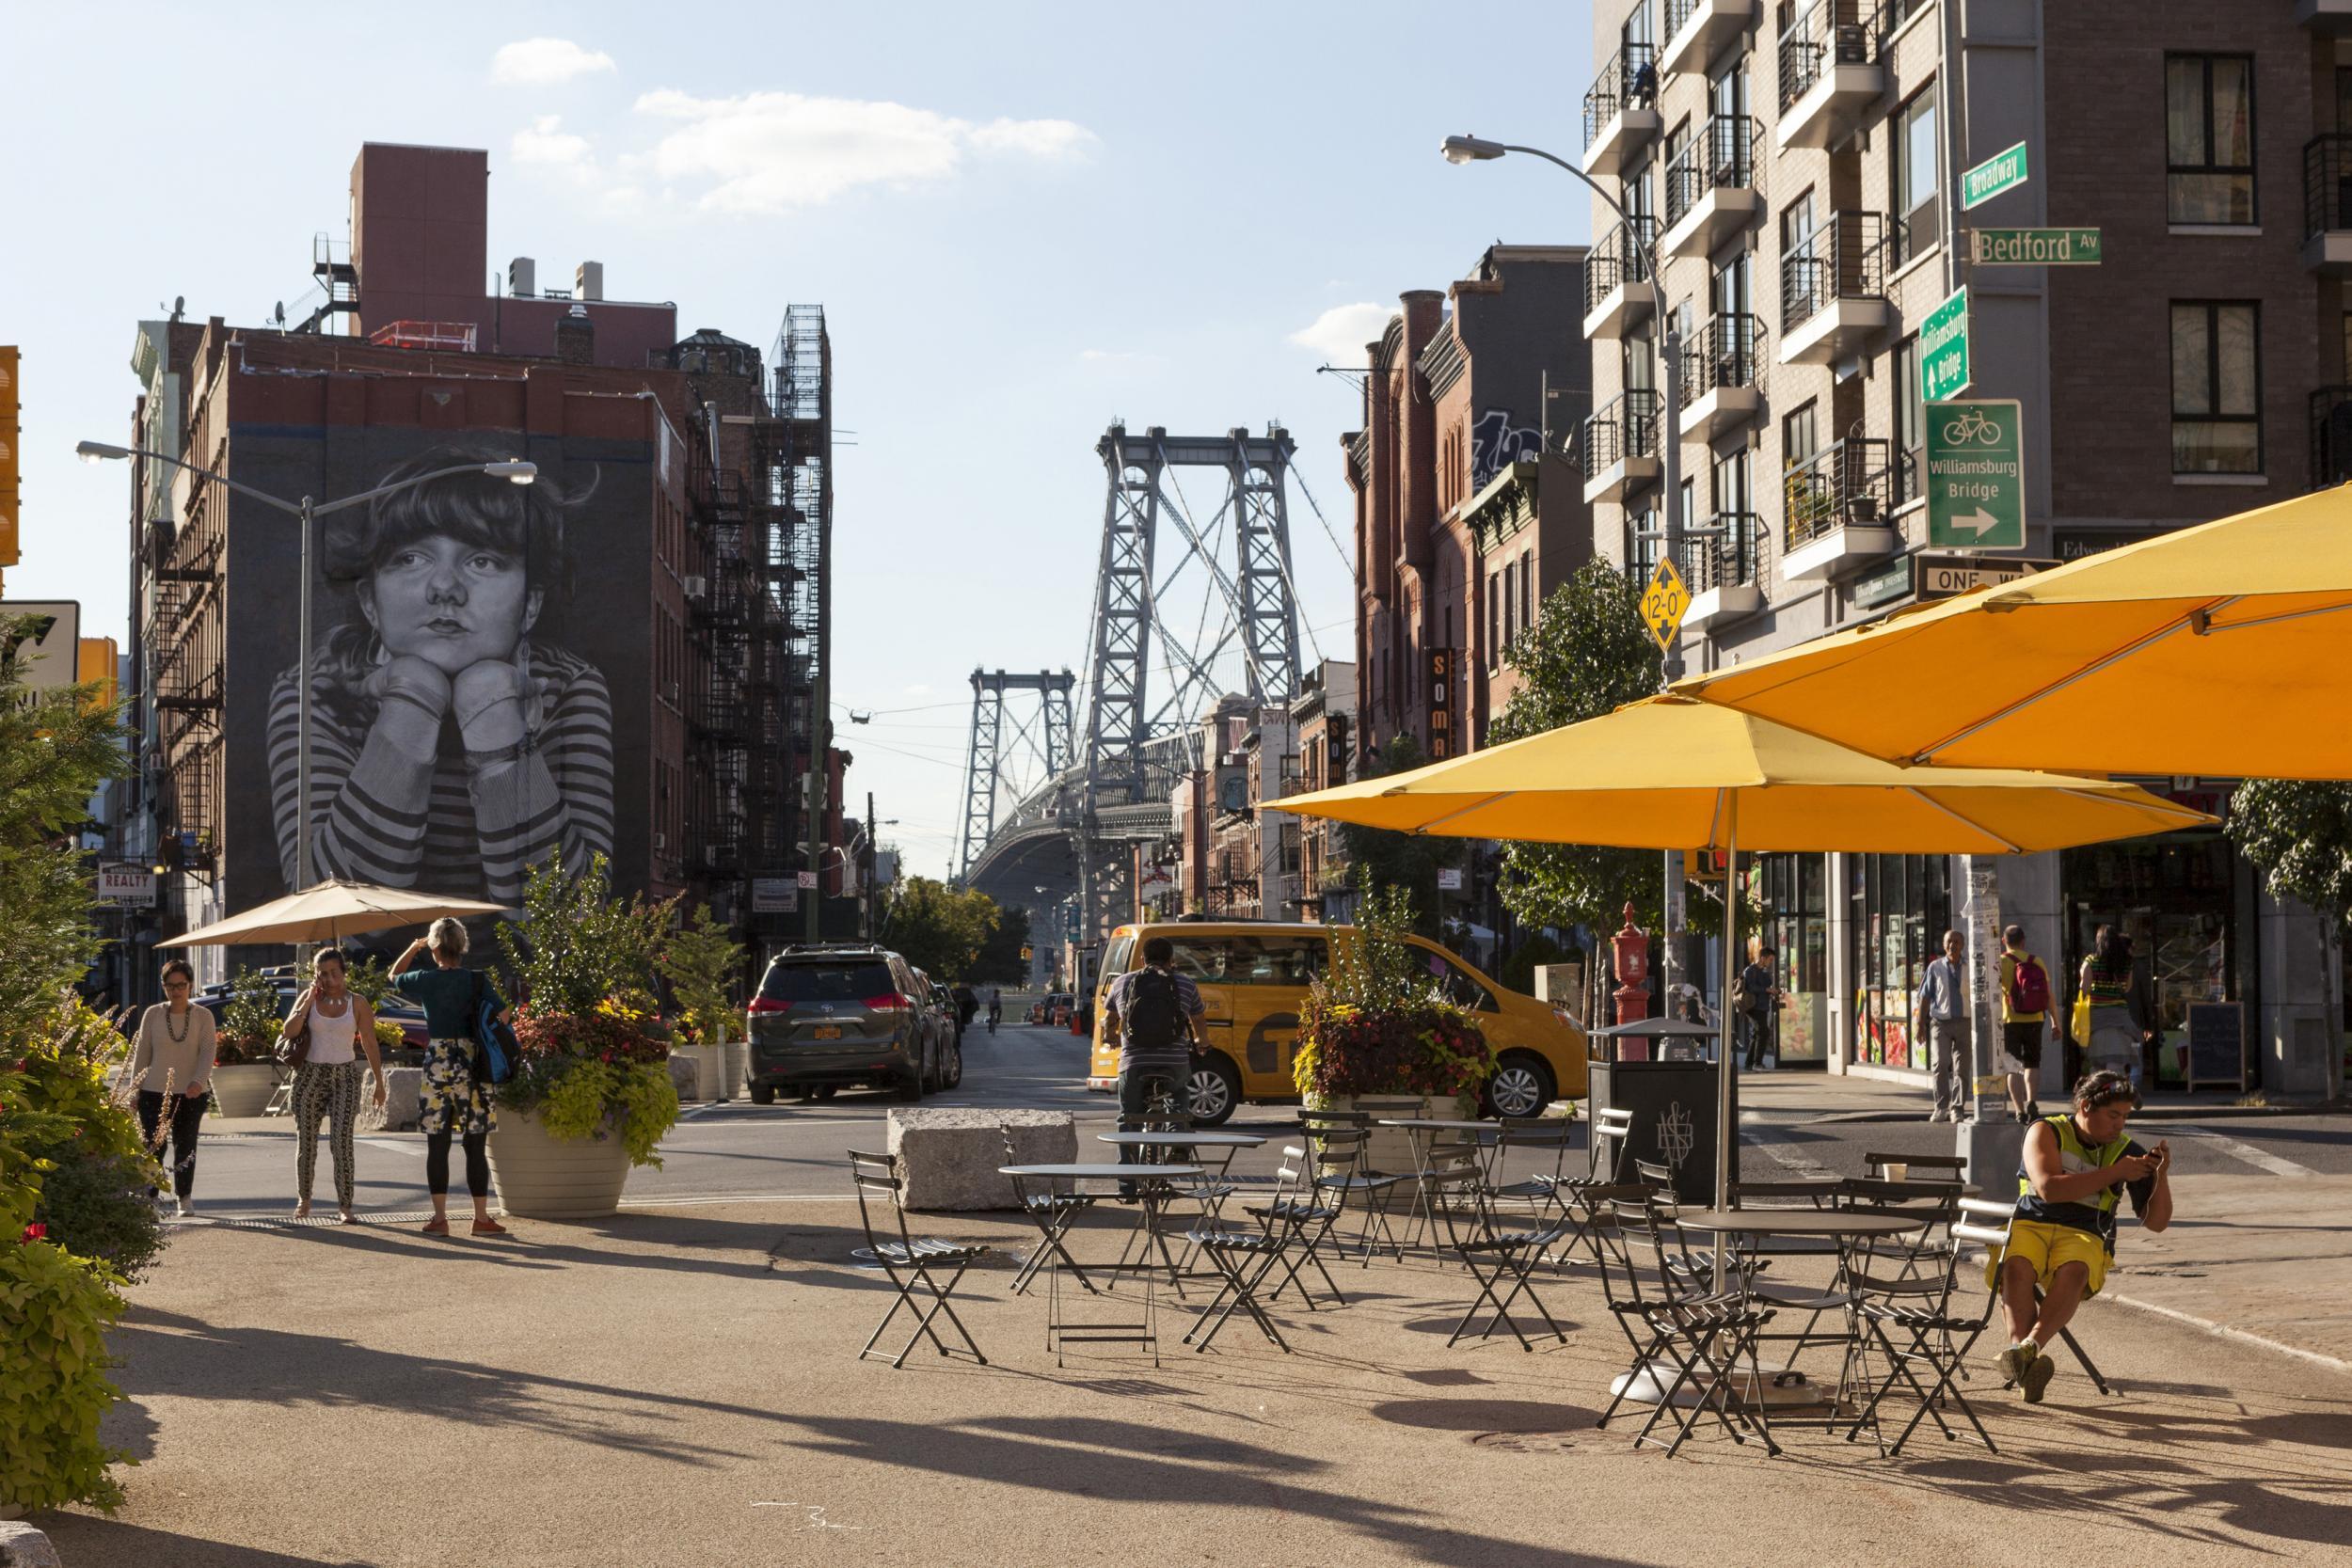 Williamsburg is still the coolest New York neighbourhood